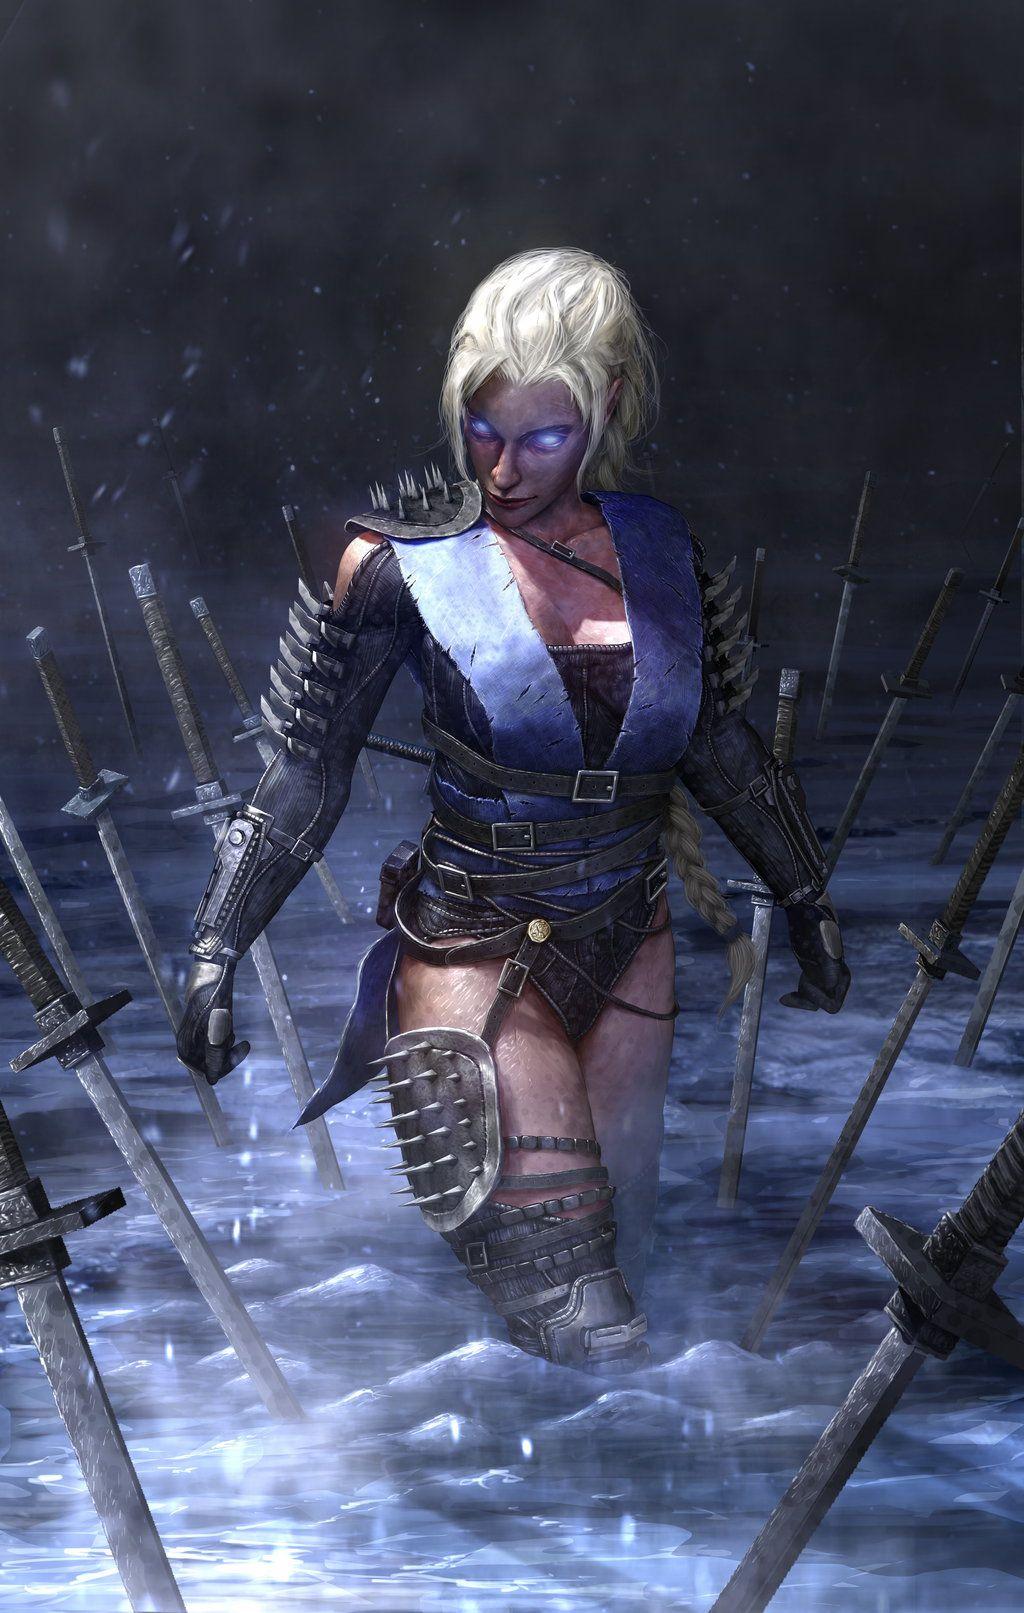 Elsa v Mortal Kombat X Mortal Kombat Mortal Kombat-8629